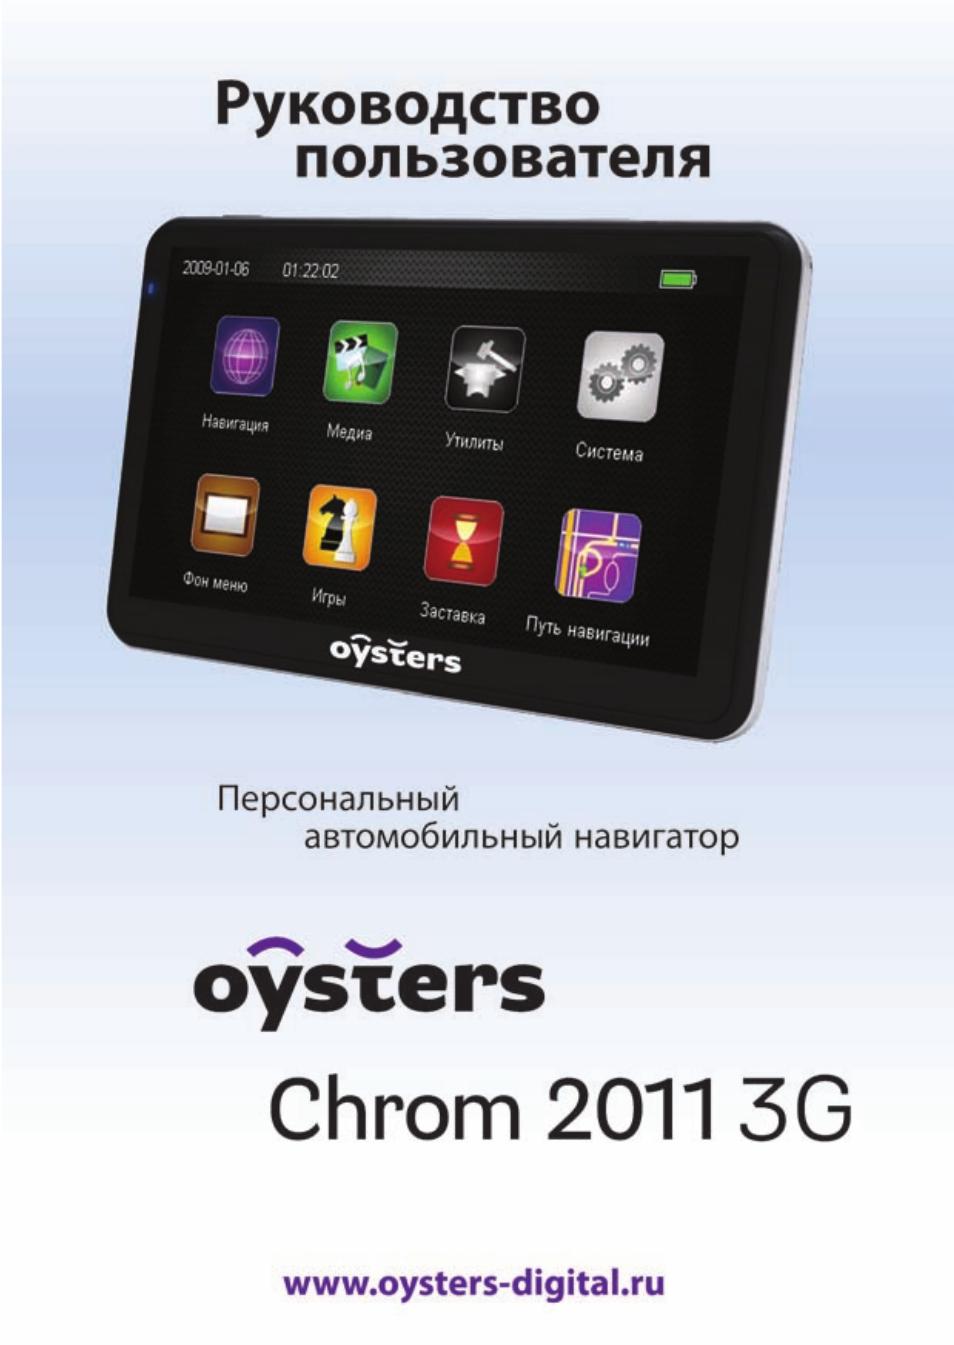 Oysters chrom 2018 3g инструкция пользователя